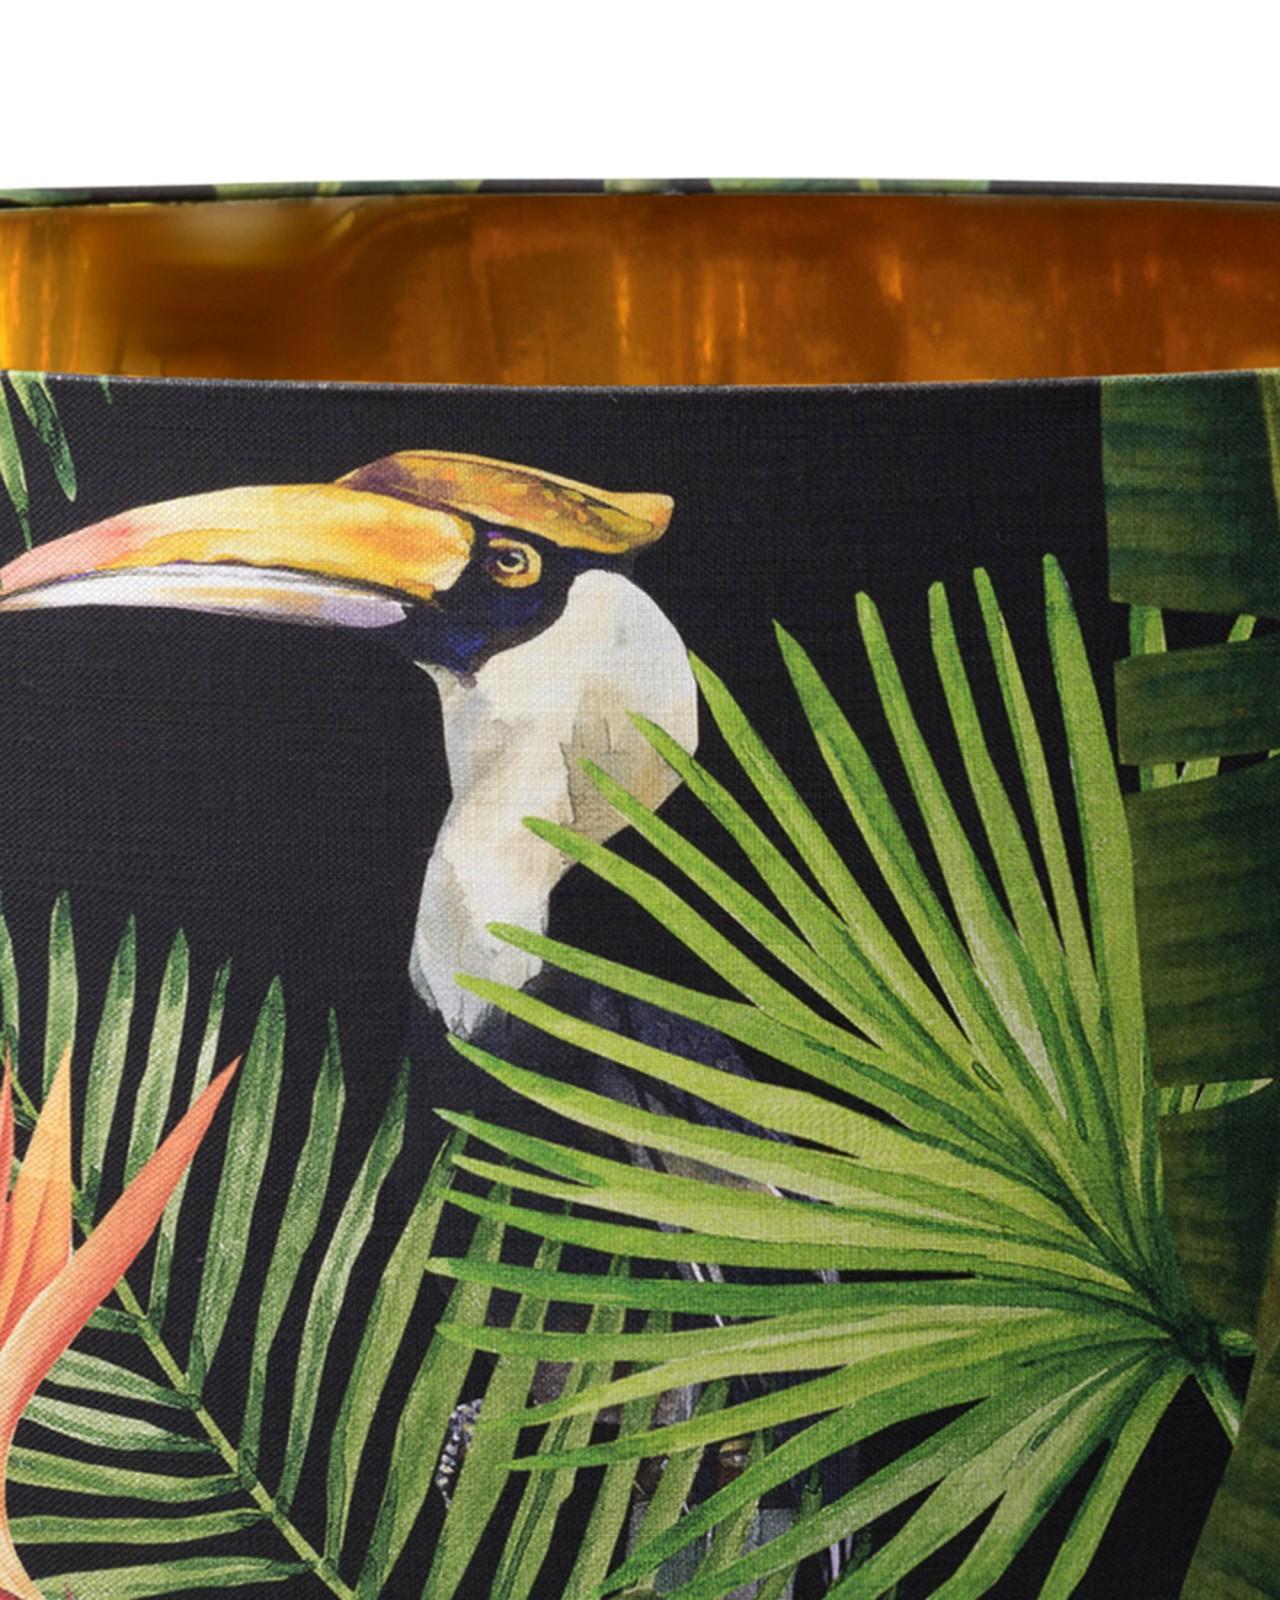 BIRDS OF PARADISE Lampshade